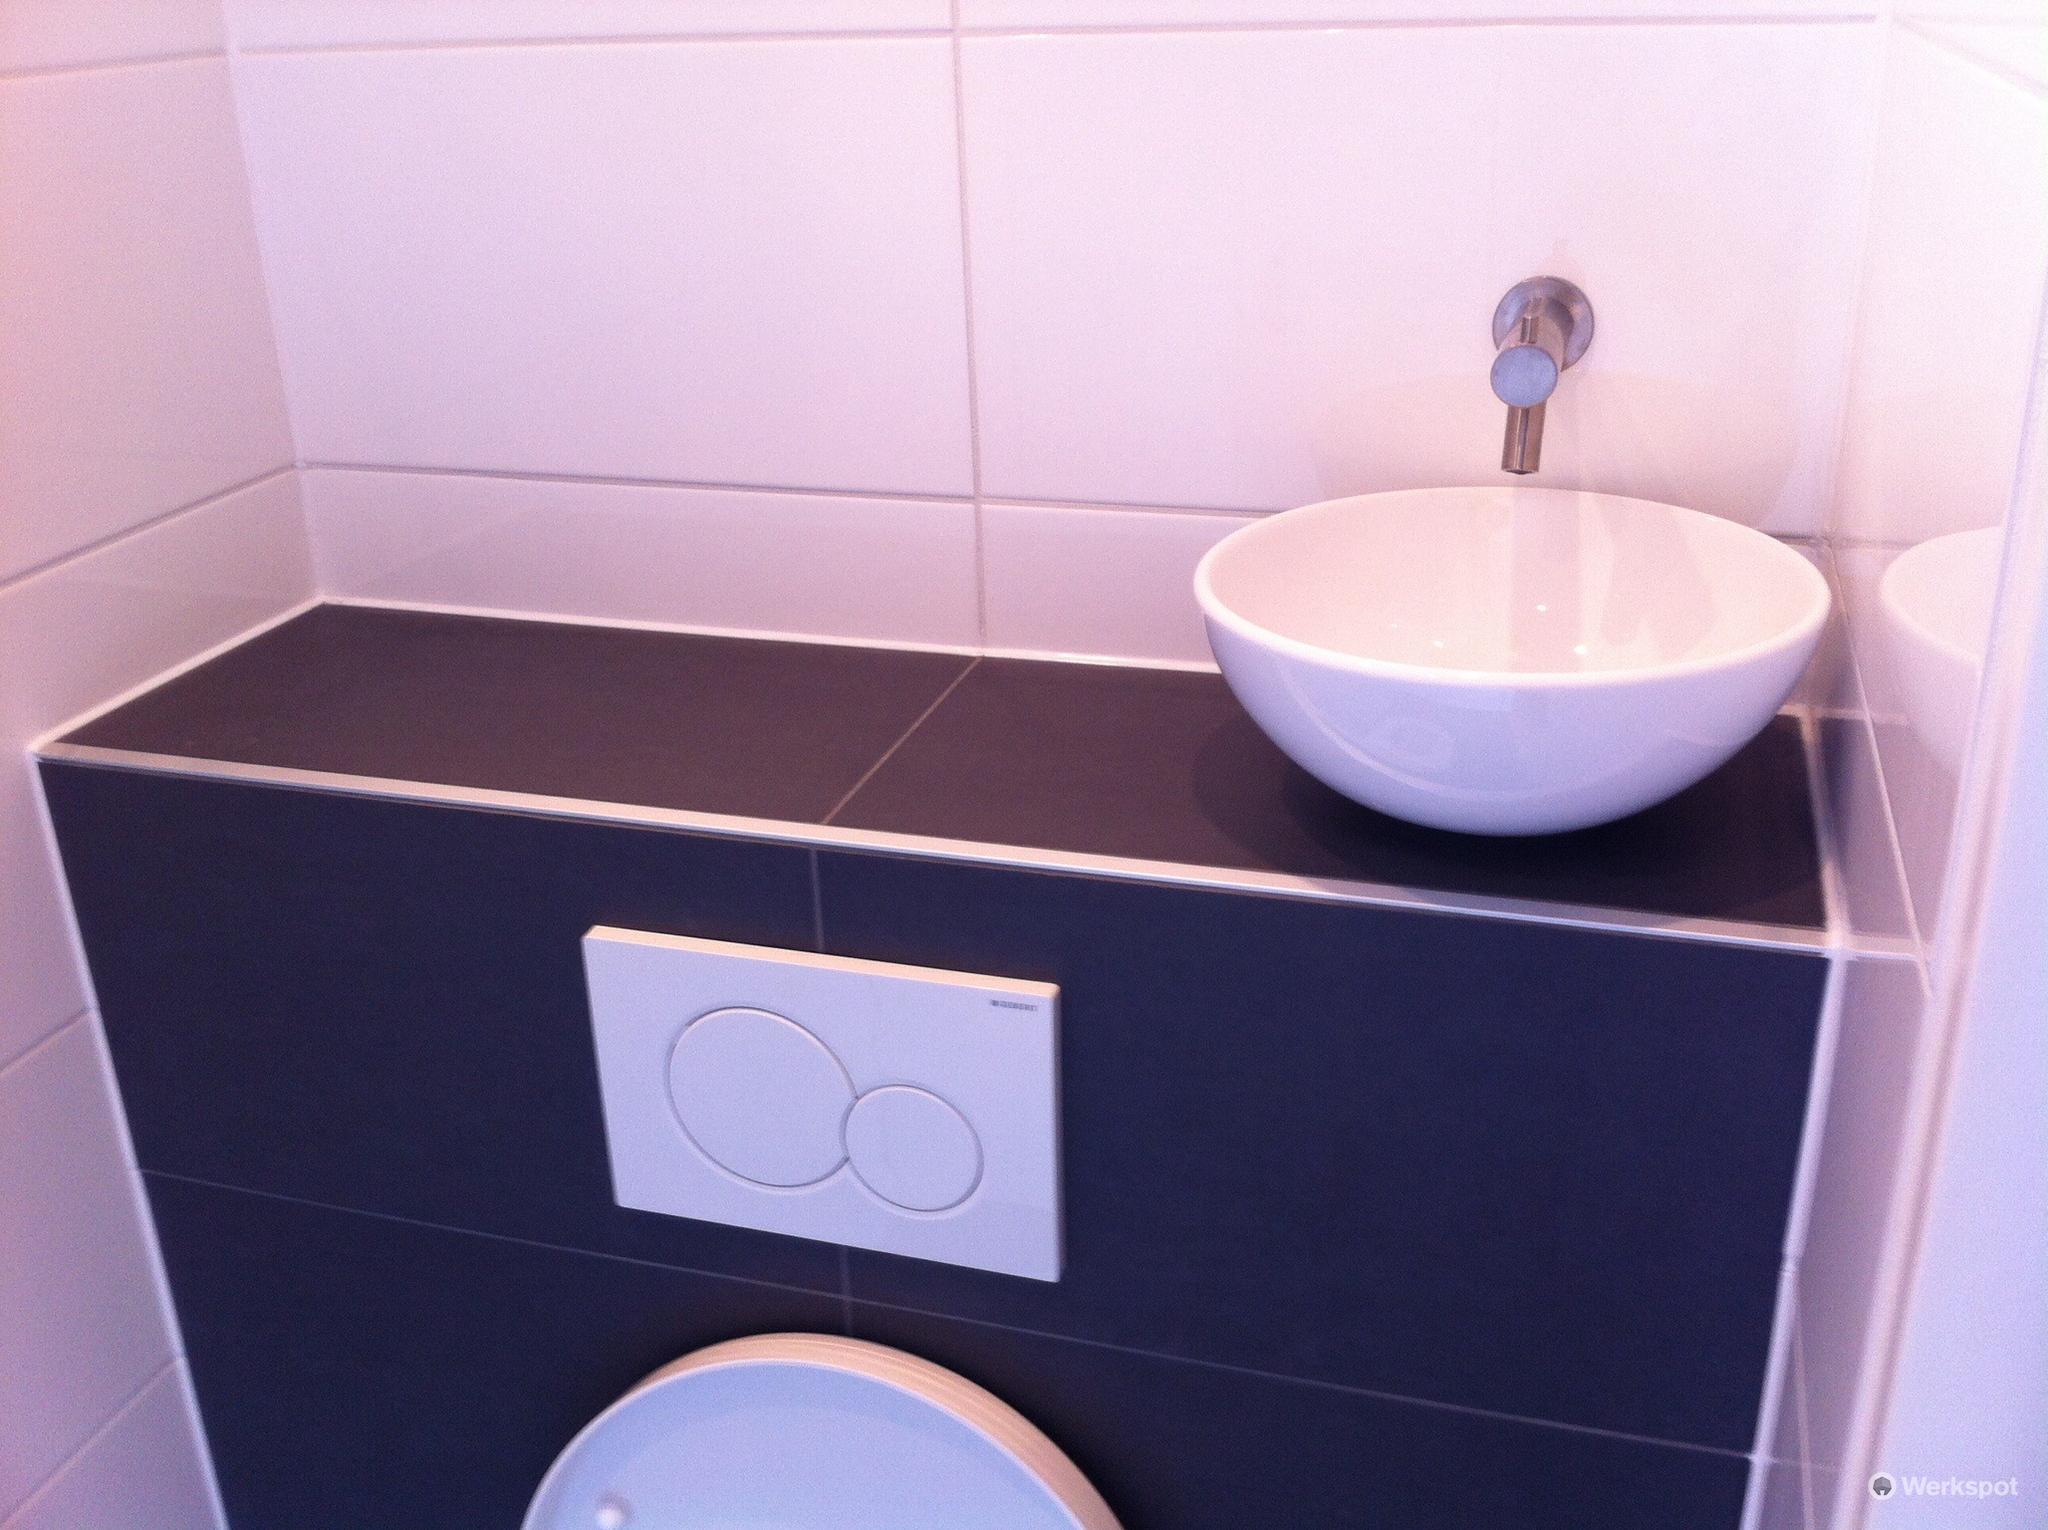 Staand Toilet Vervangen : Vervangen staand toilet naar hang fontein werkspot